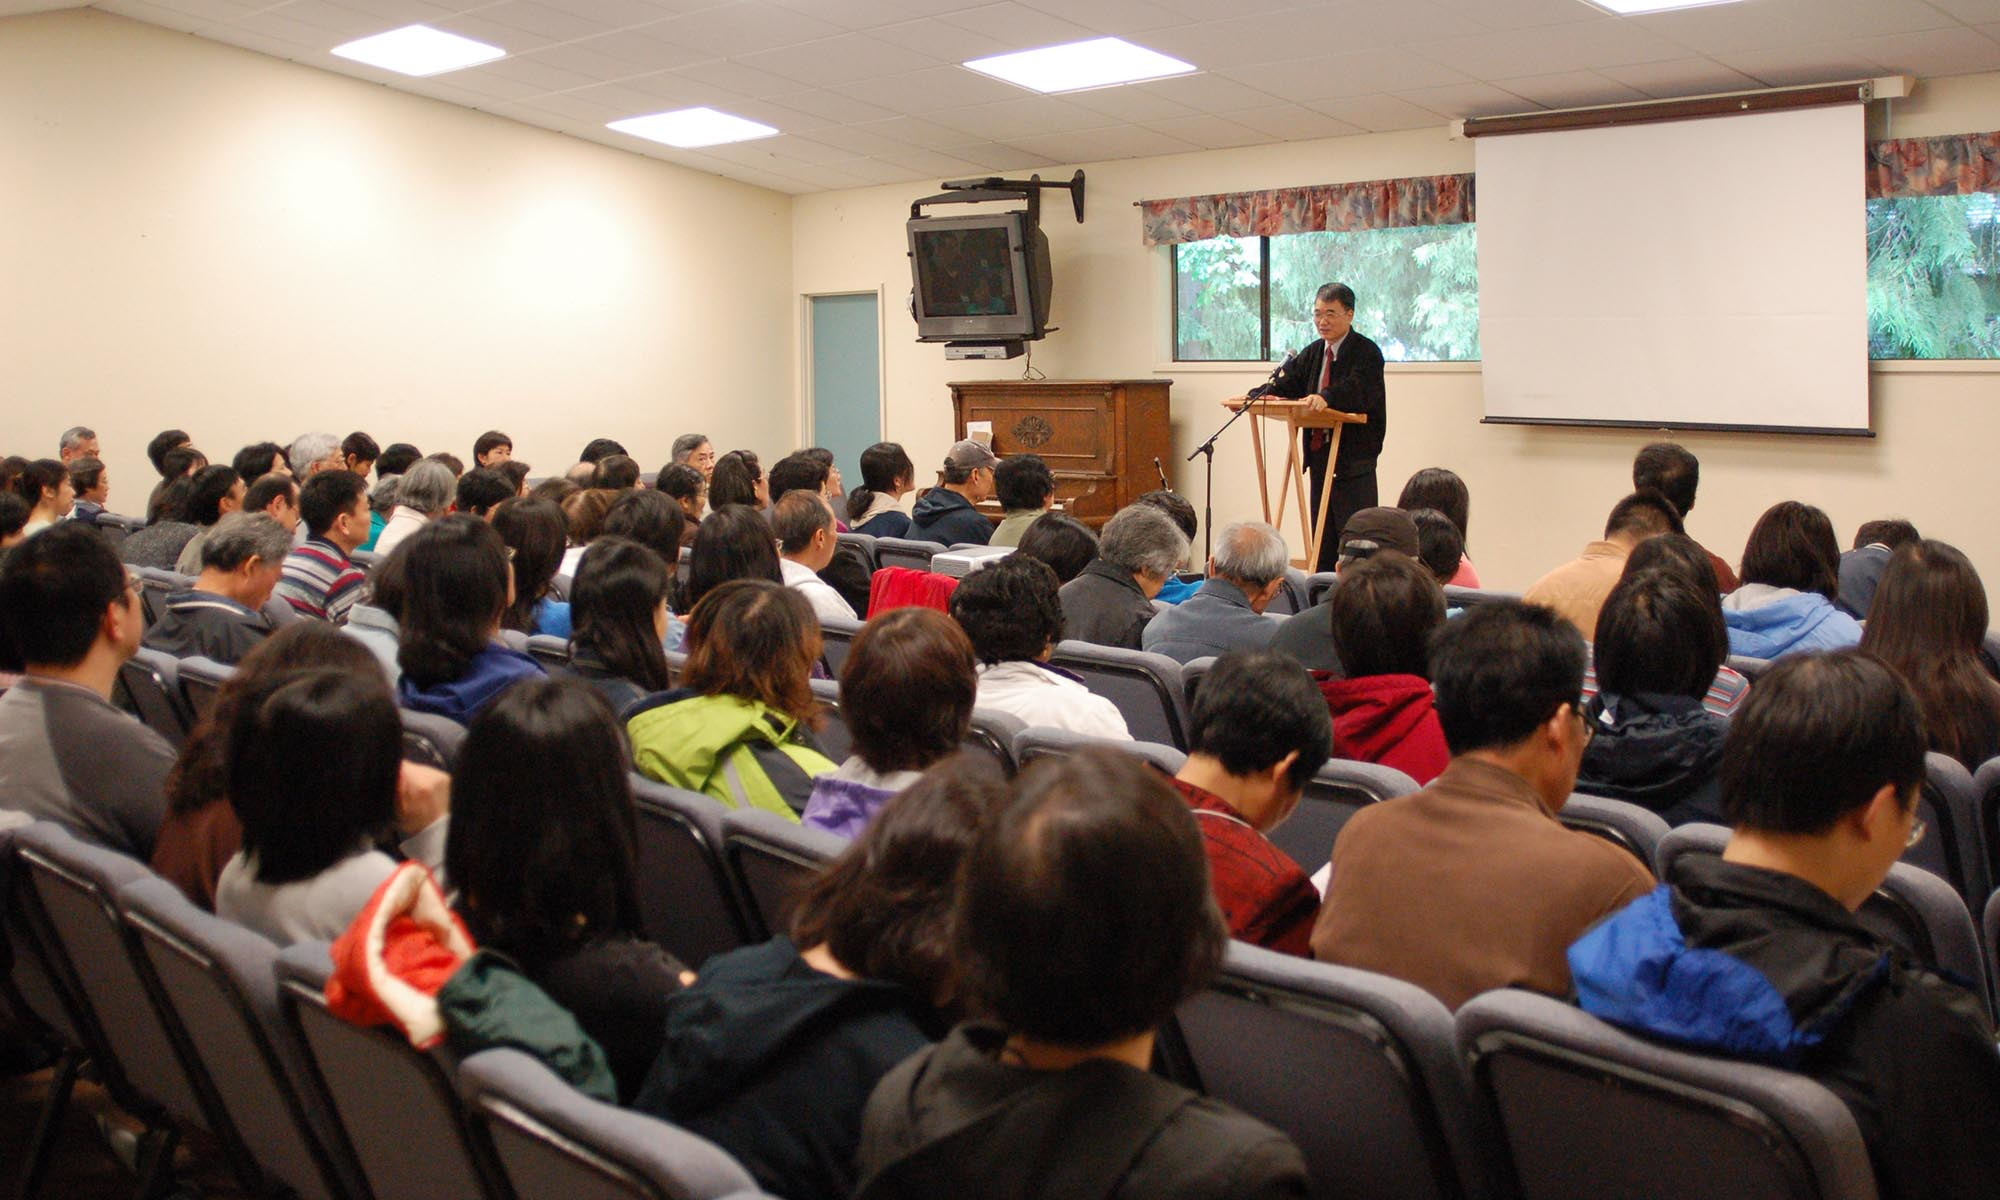 Church retreat program